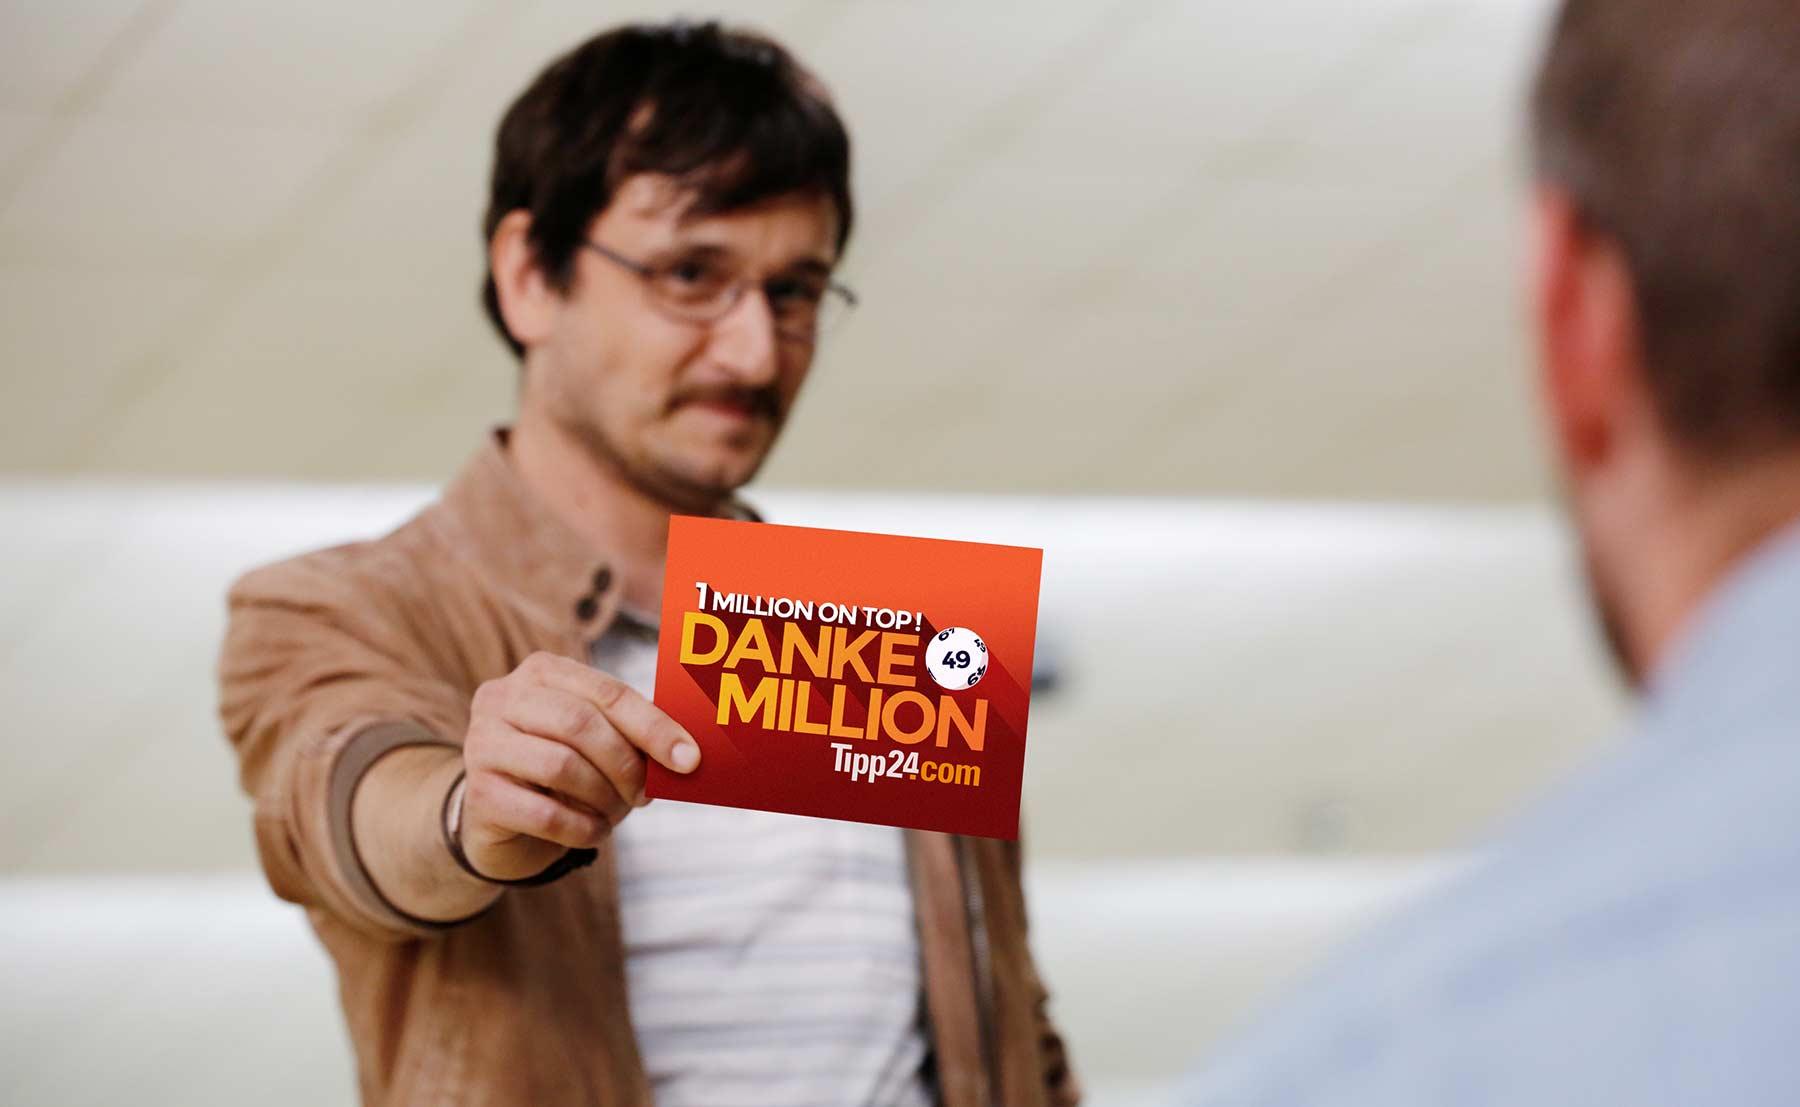 Besonderes Freundschafts-Geschenk: die DANKE-MILLION Tipp24-DankeMillion_01